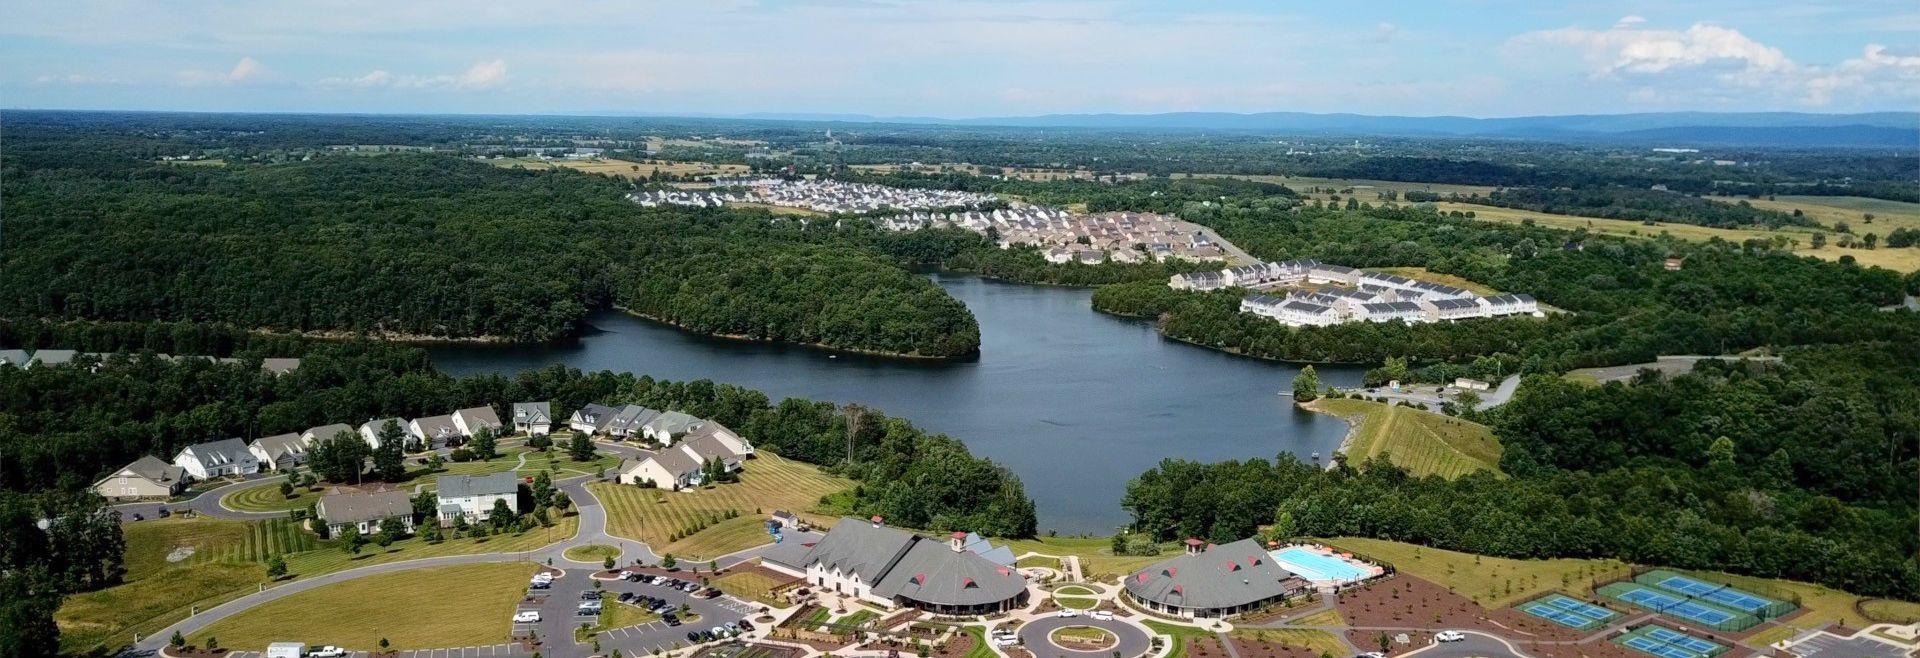 Community & Club at Lake Frederick:Lake Frederick